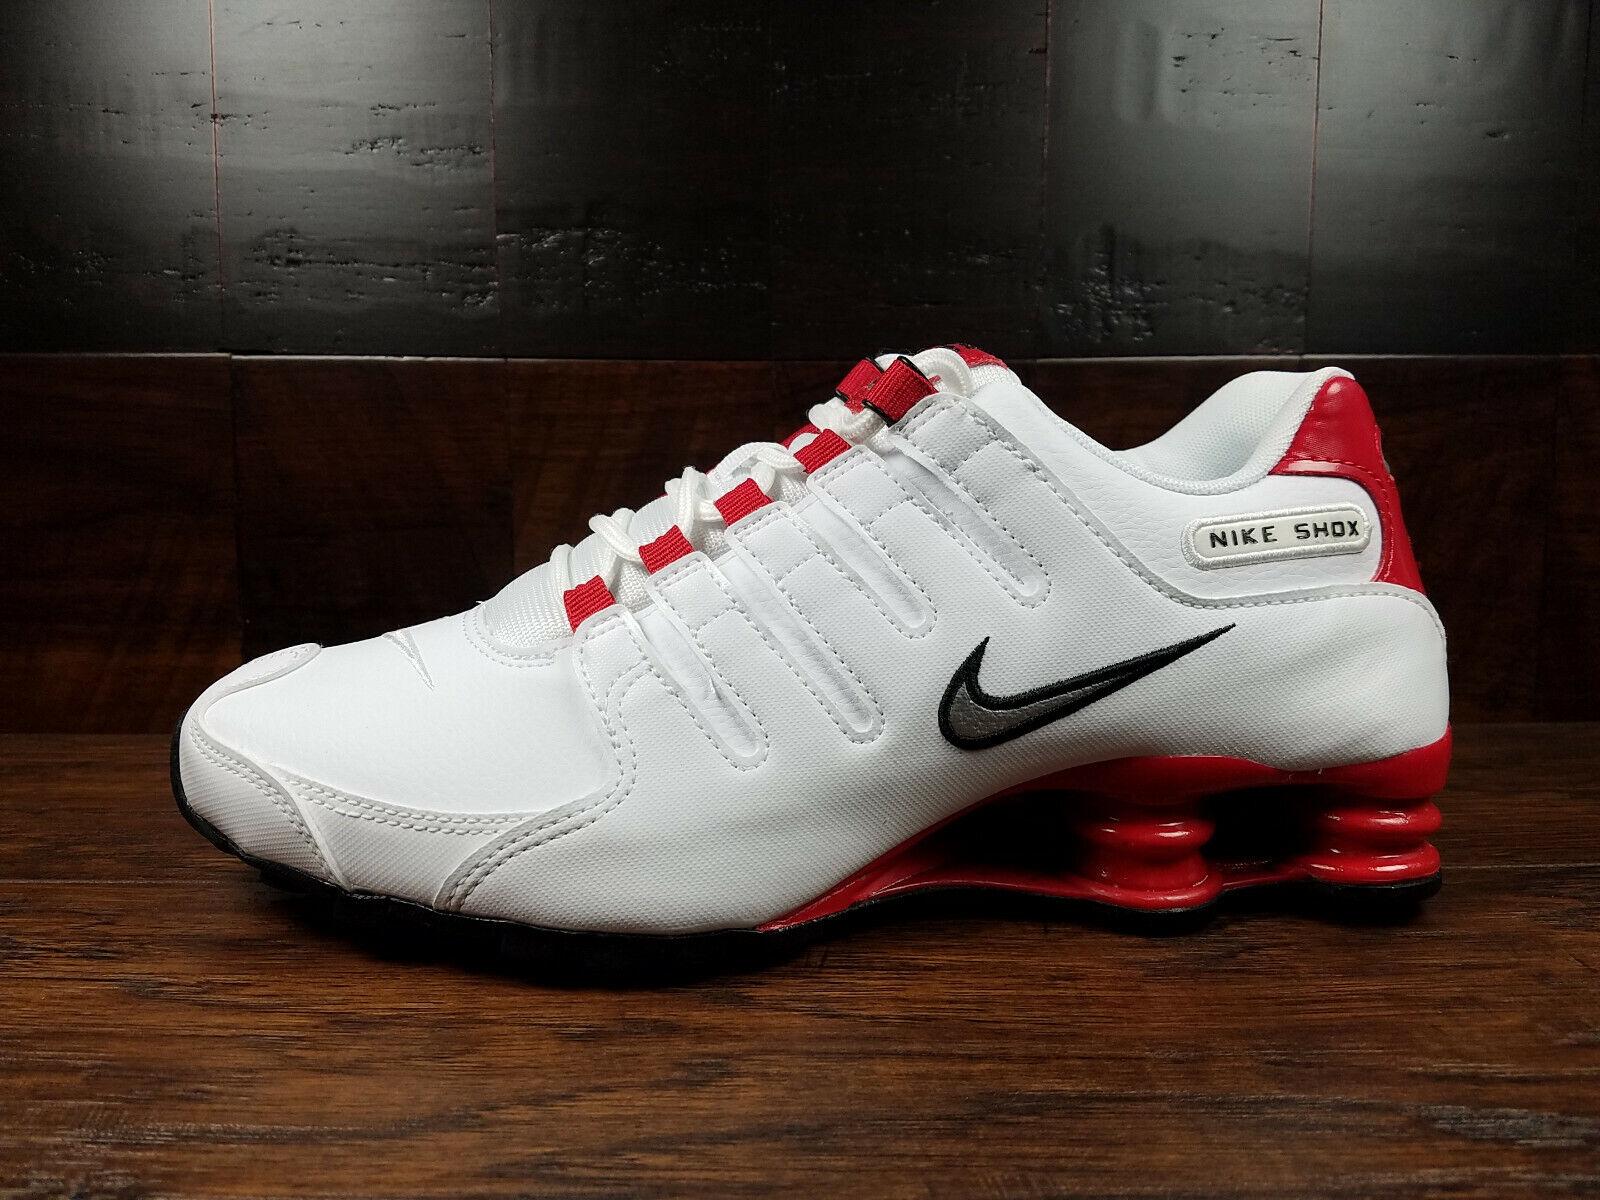 new concept f50cb 4fc4a Nike SHOX NZ EU (White / Metallic Silver / Uni Red) NSW [378341-110] Mens  7-14